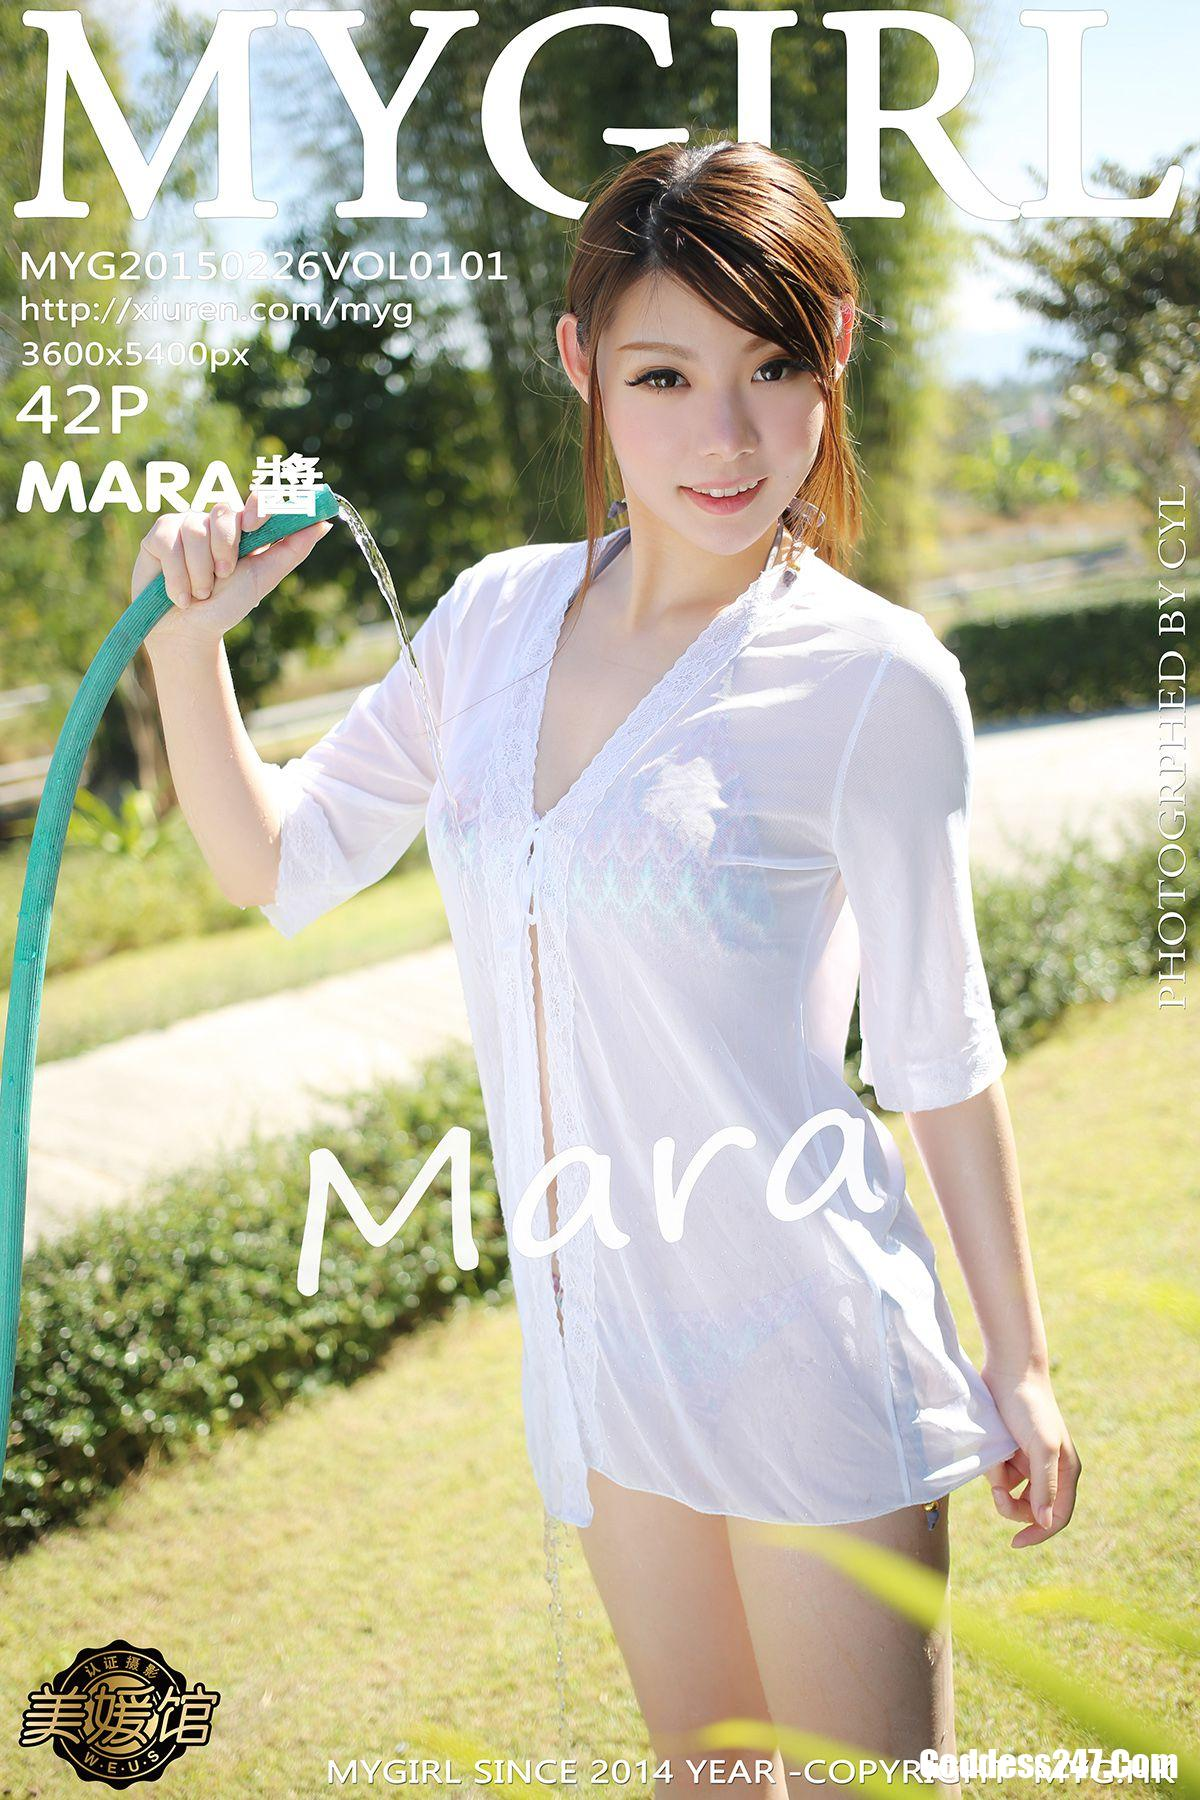 MyGirl Vol.101 MARA醬